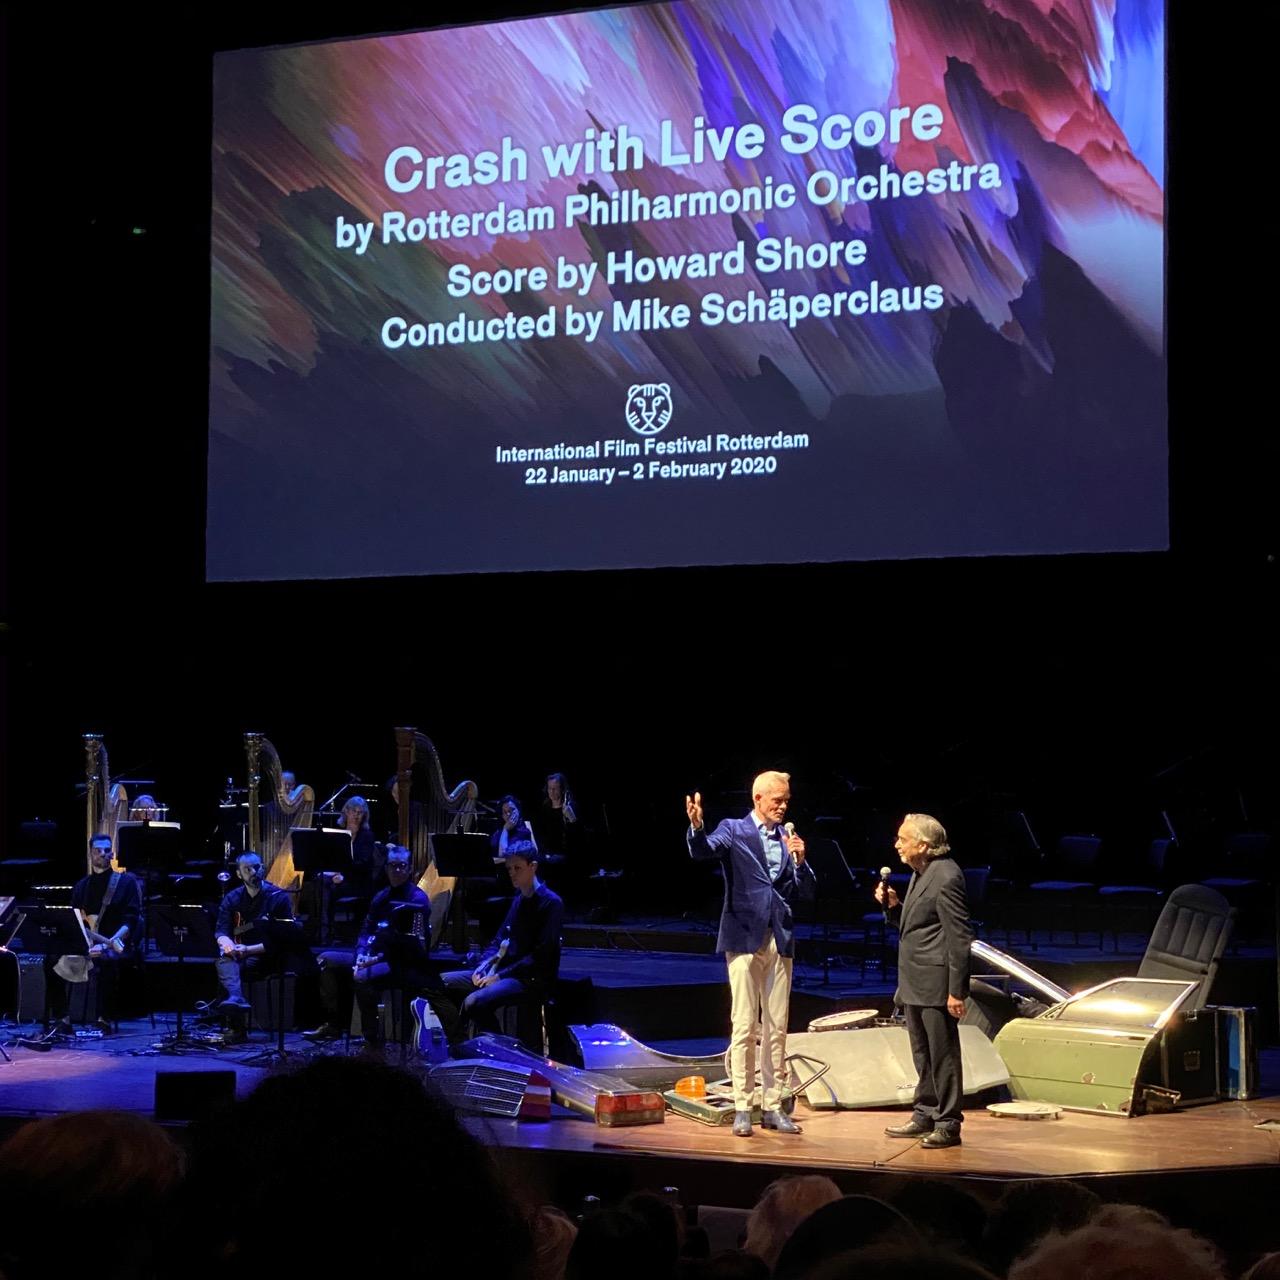 Crash cronenberg live score rotterdam philharmonic